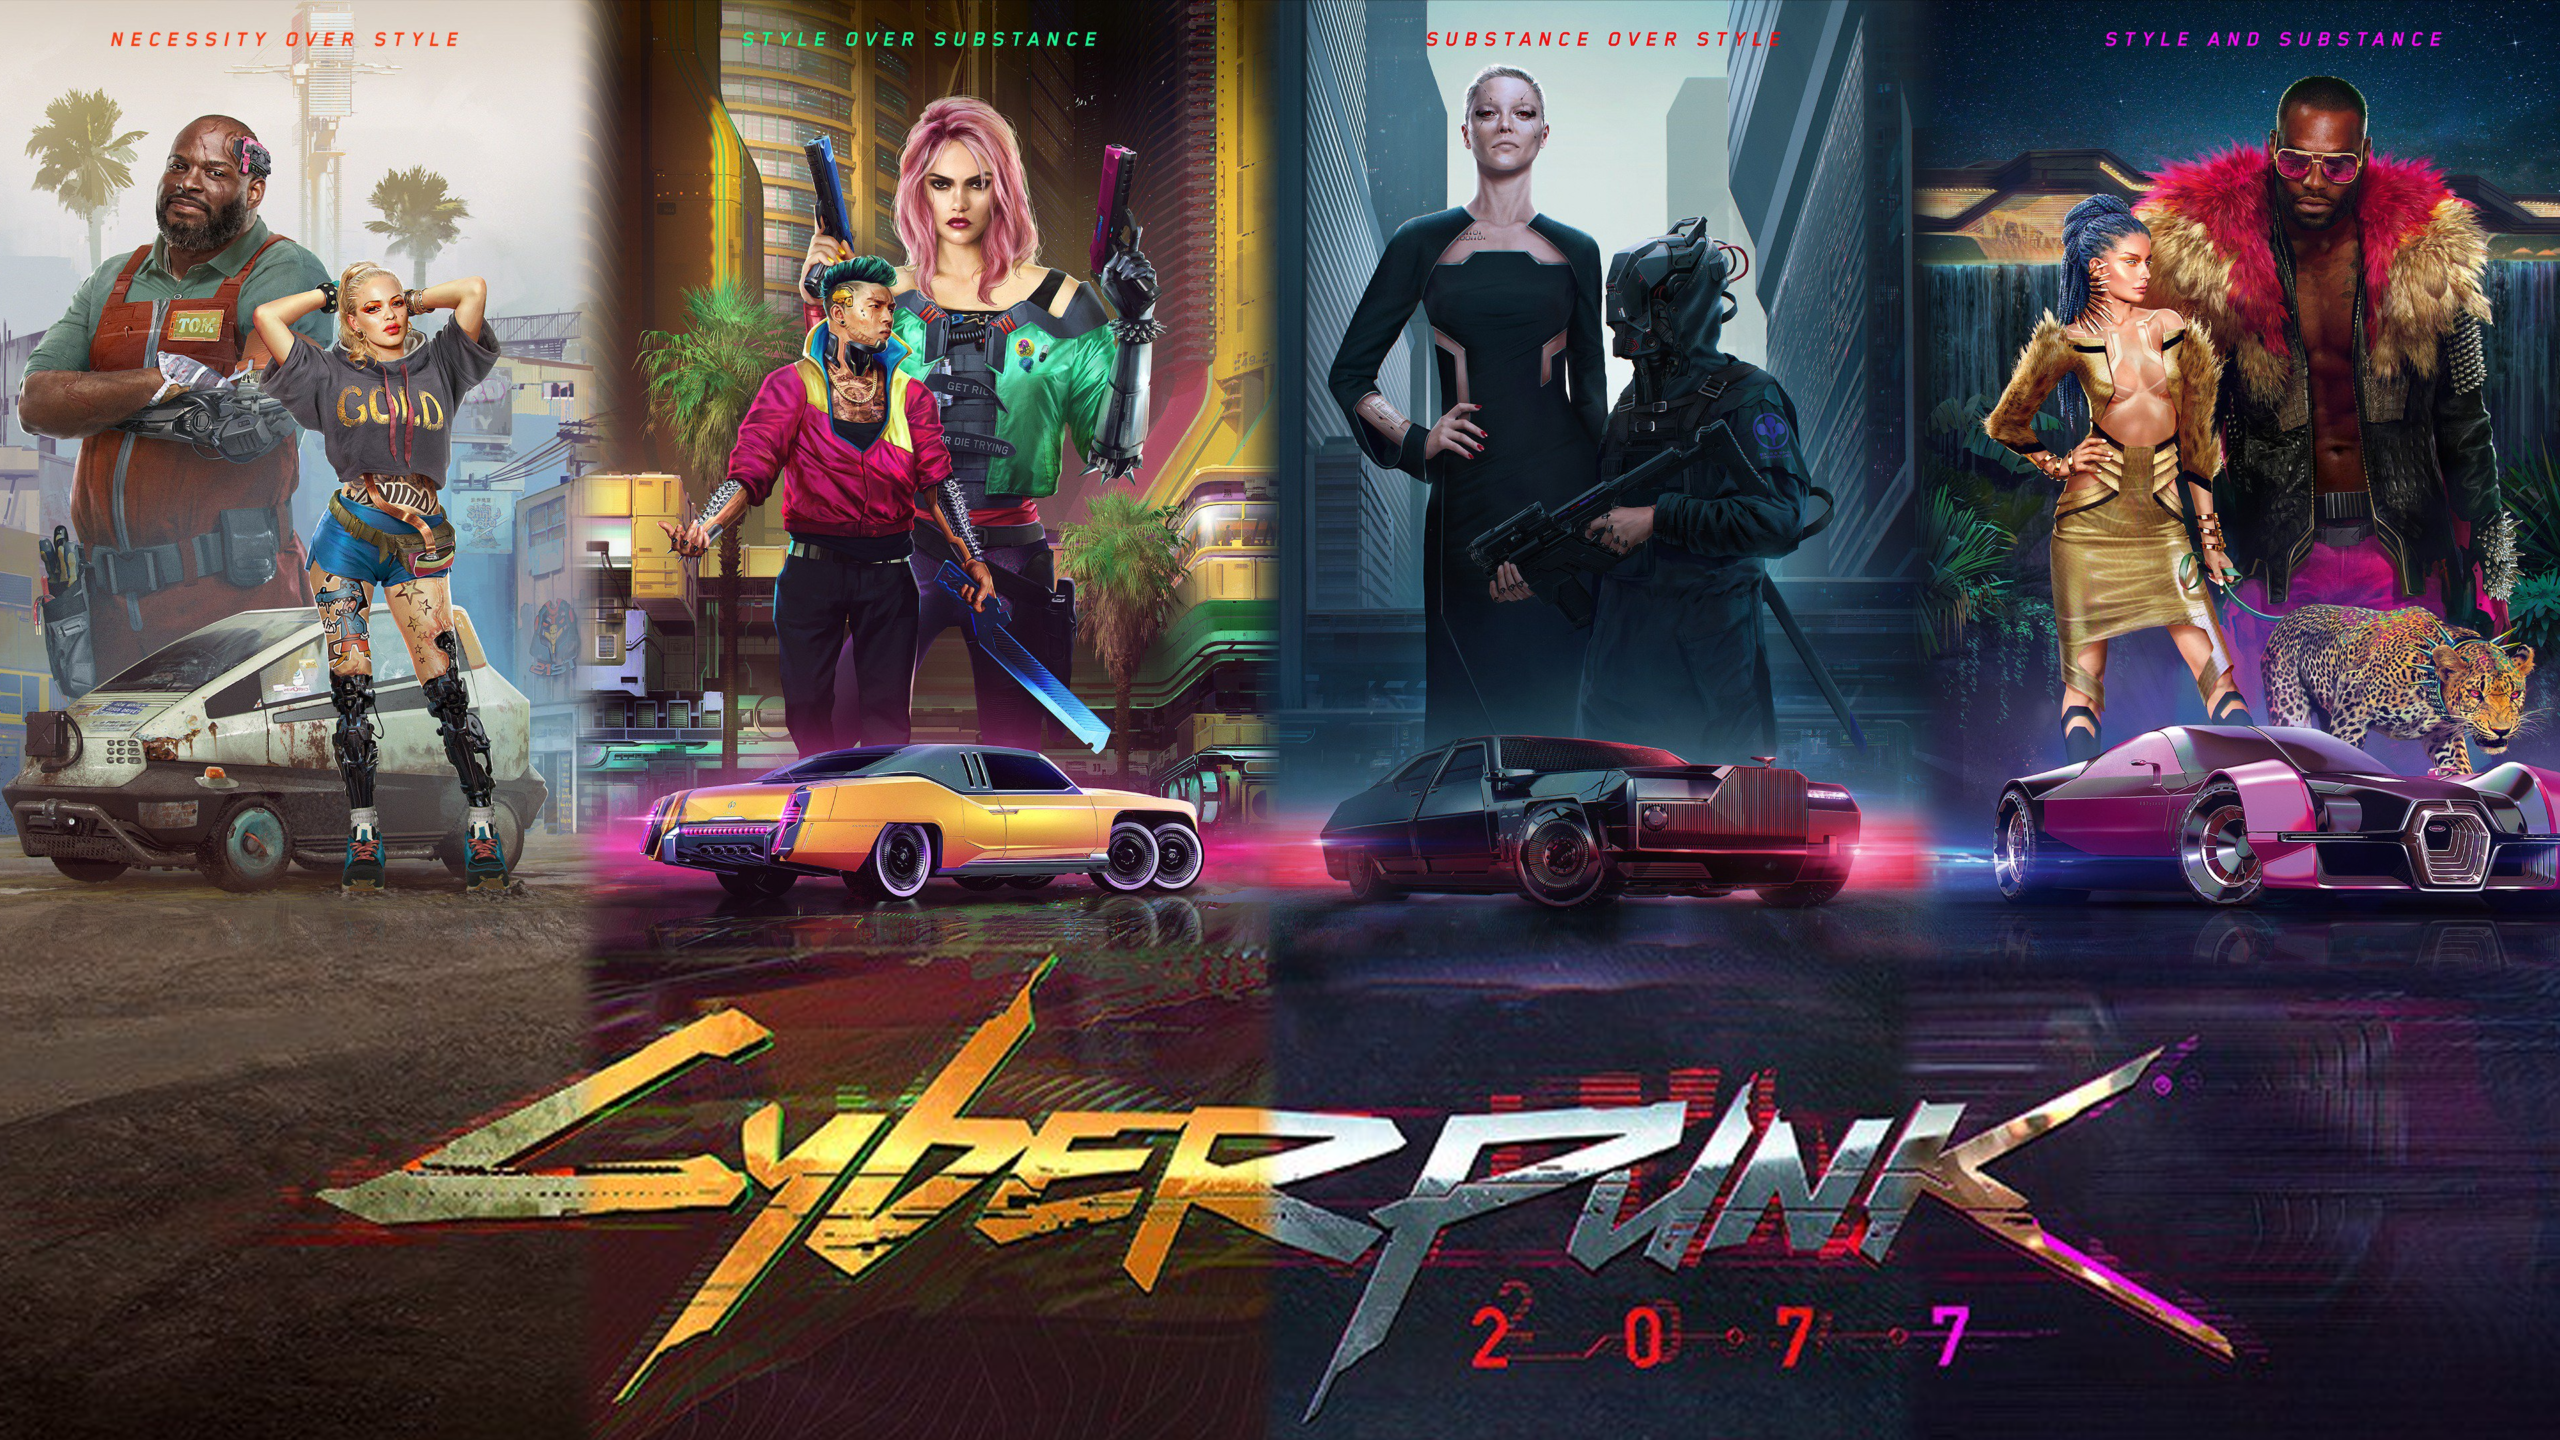 Cyberpunk 2077 promette più di 175 ore di gioco